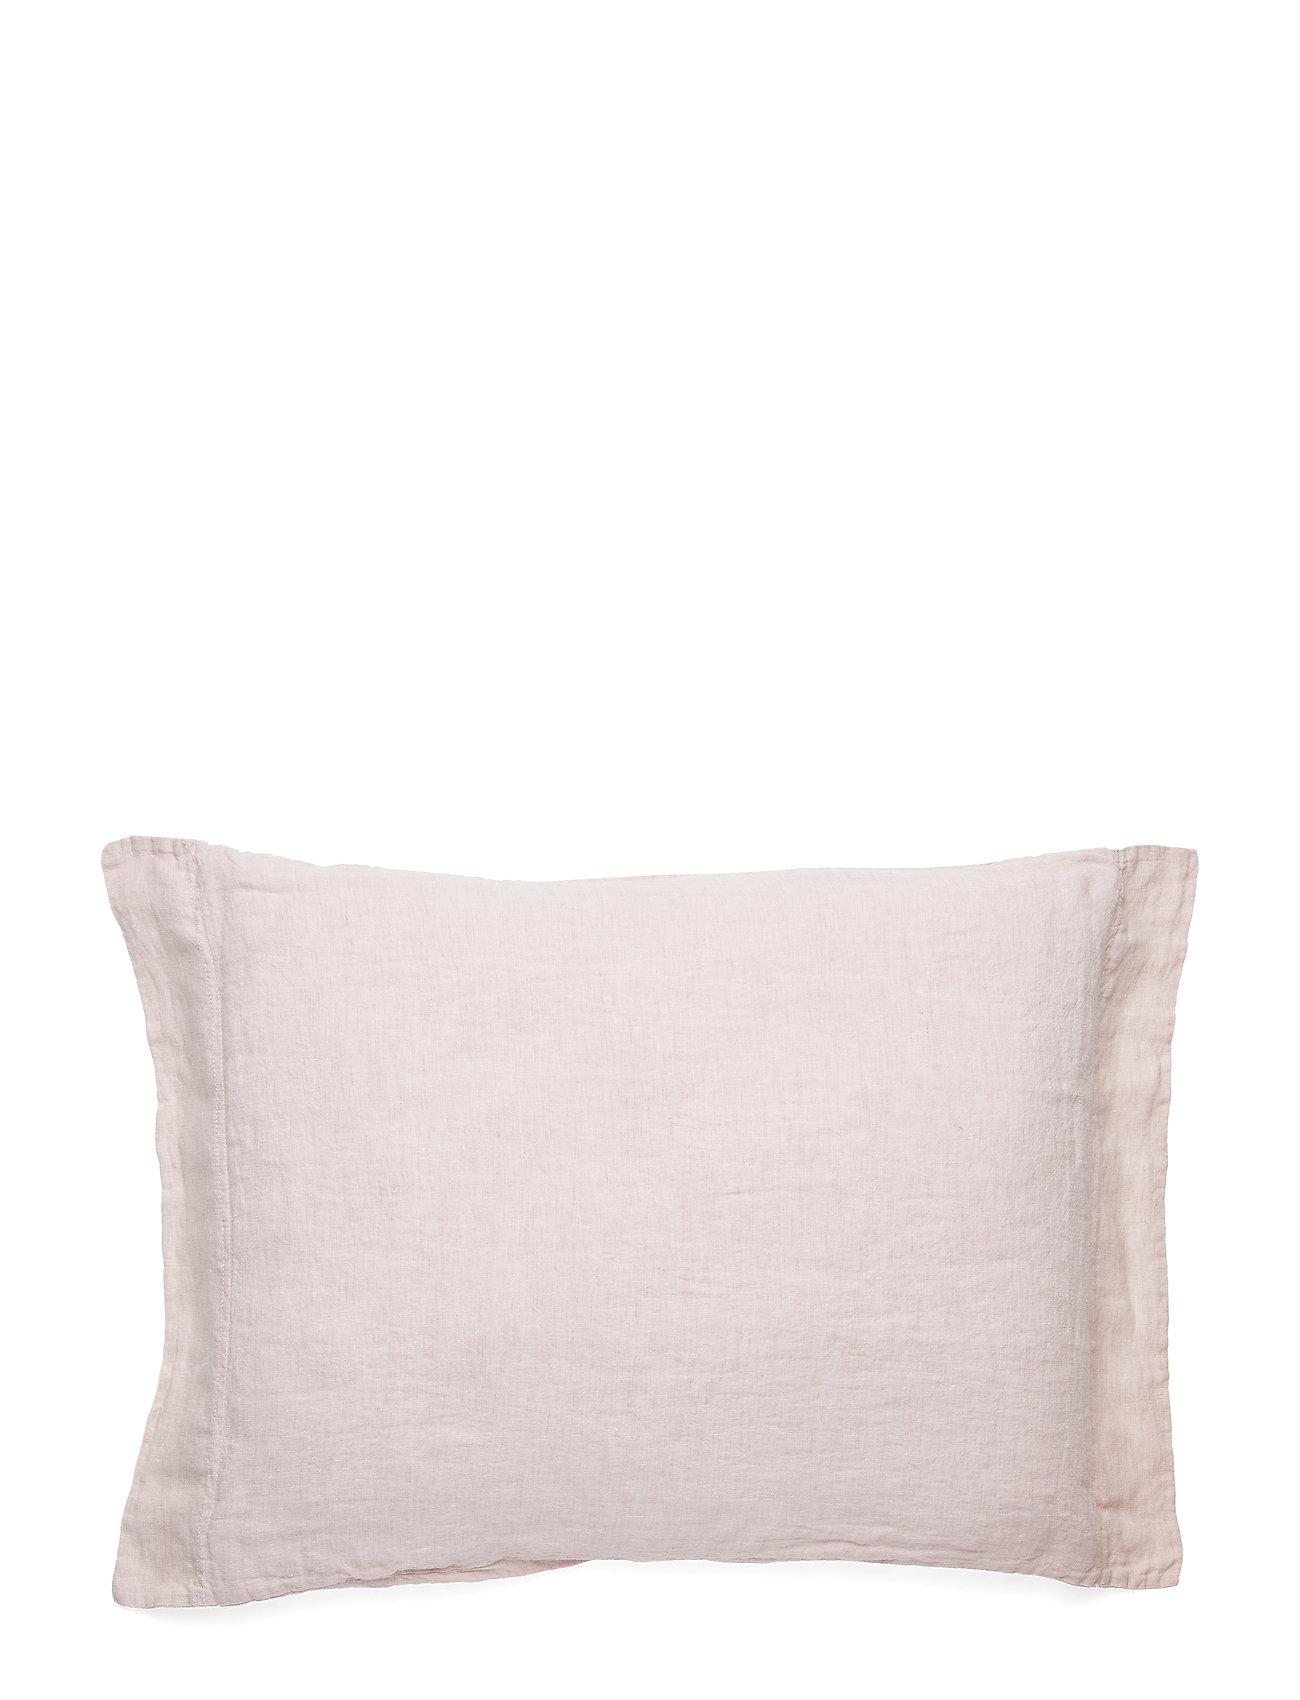 Dirty Linen Animeaux Head Pillow case - BON BON